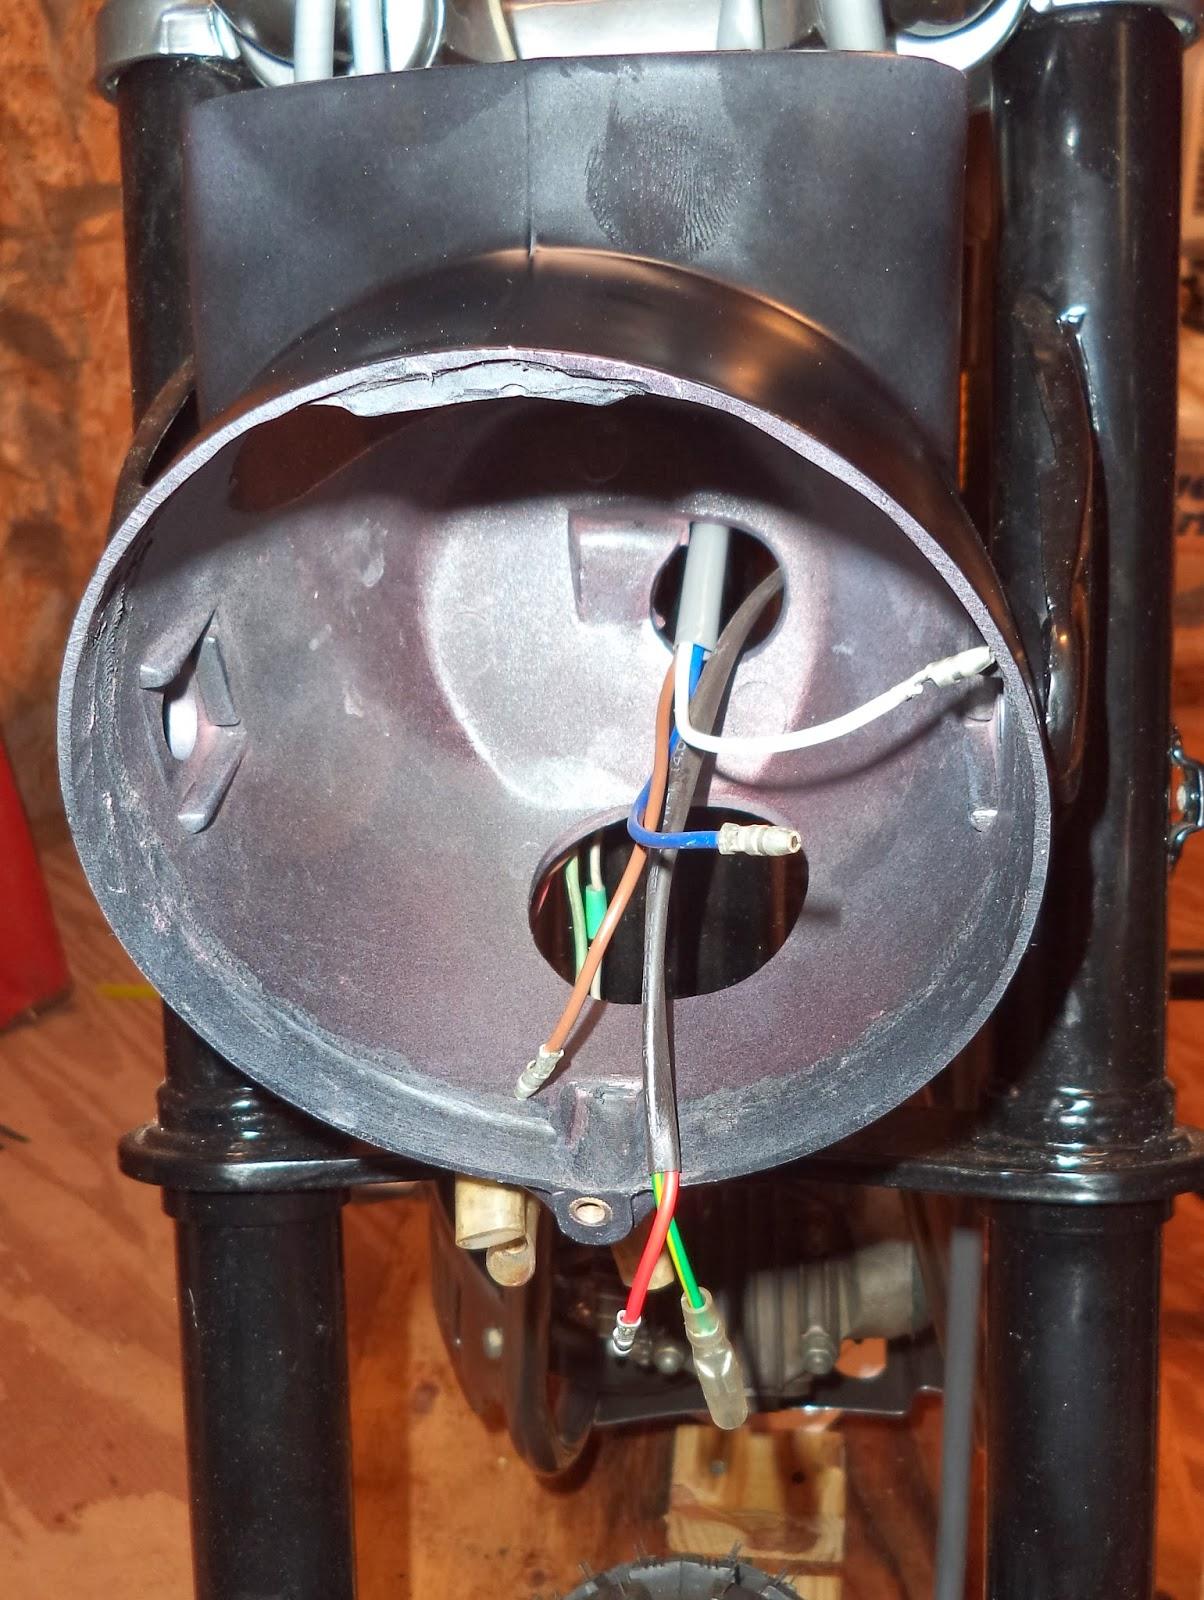 1970 Honda Ct70 Headlight Wiring Wire Data Schema Trail Tear It Up Fix Repeat Most Of The And Speedo Cable Rh Tearitupfixitrepeat Blogspot Com 1975 1971